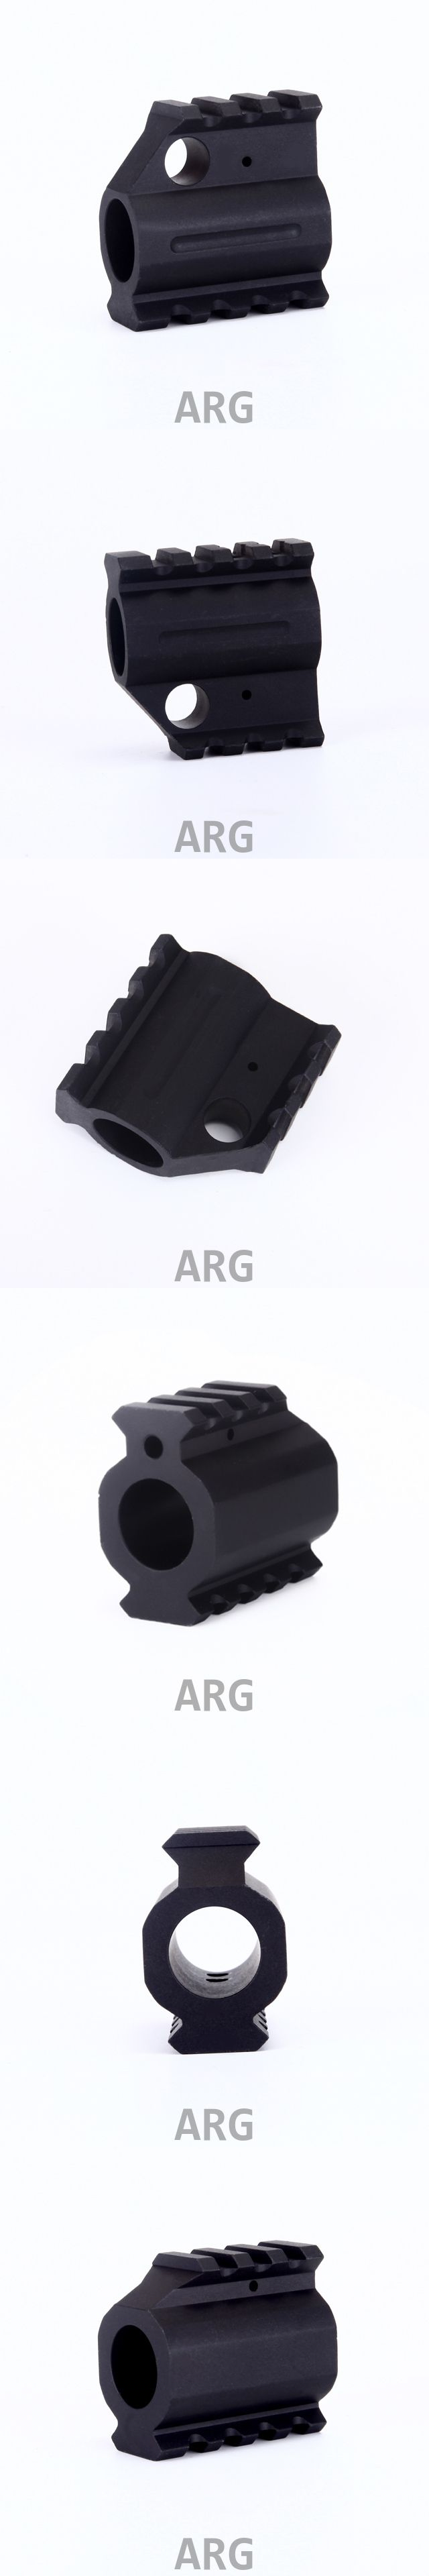 Ar.223 Gas Block.750,Reg Profile Hunting Gun Accessory free float